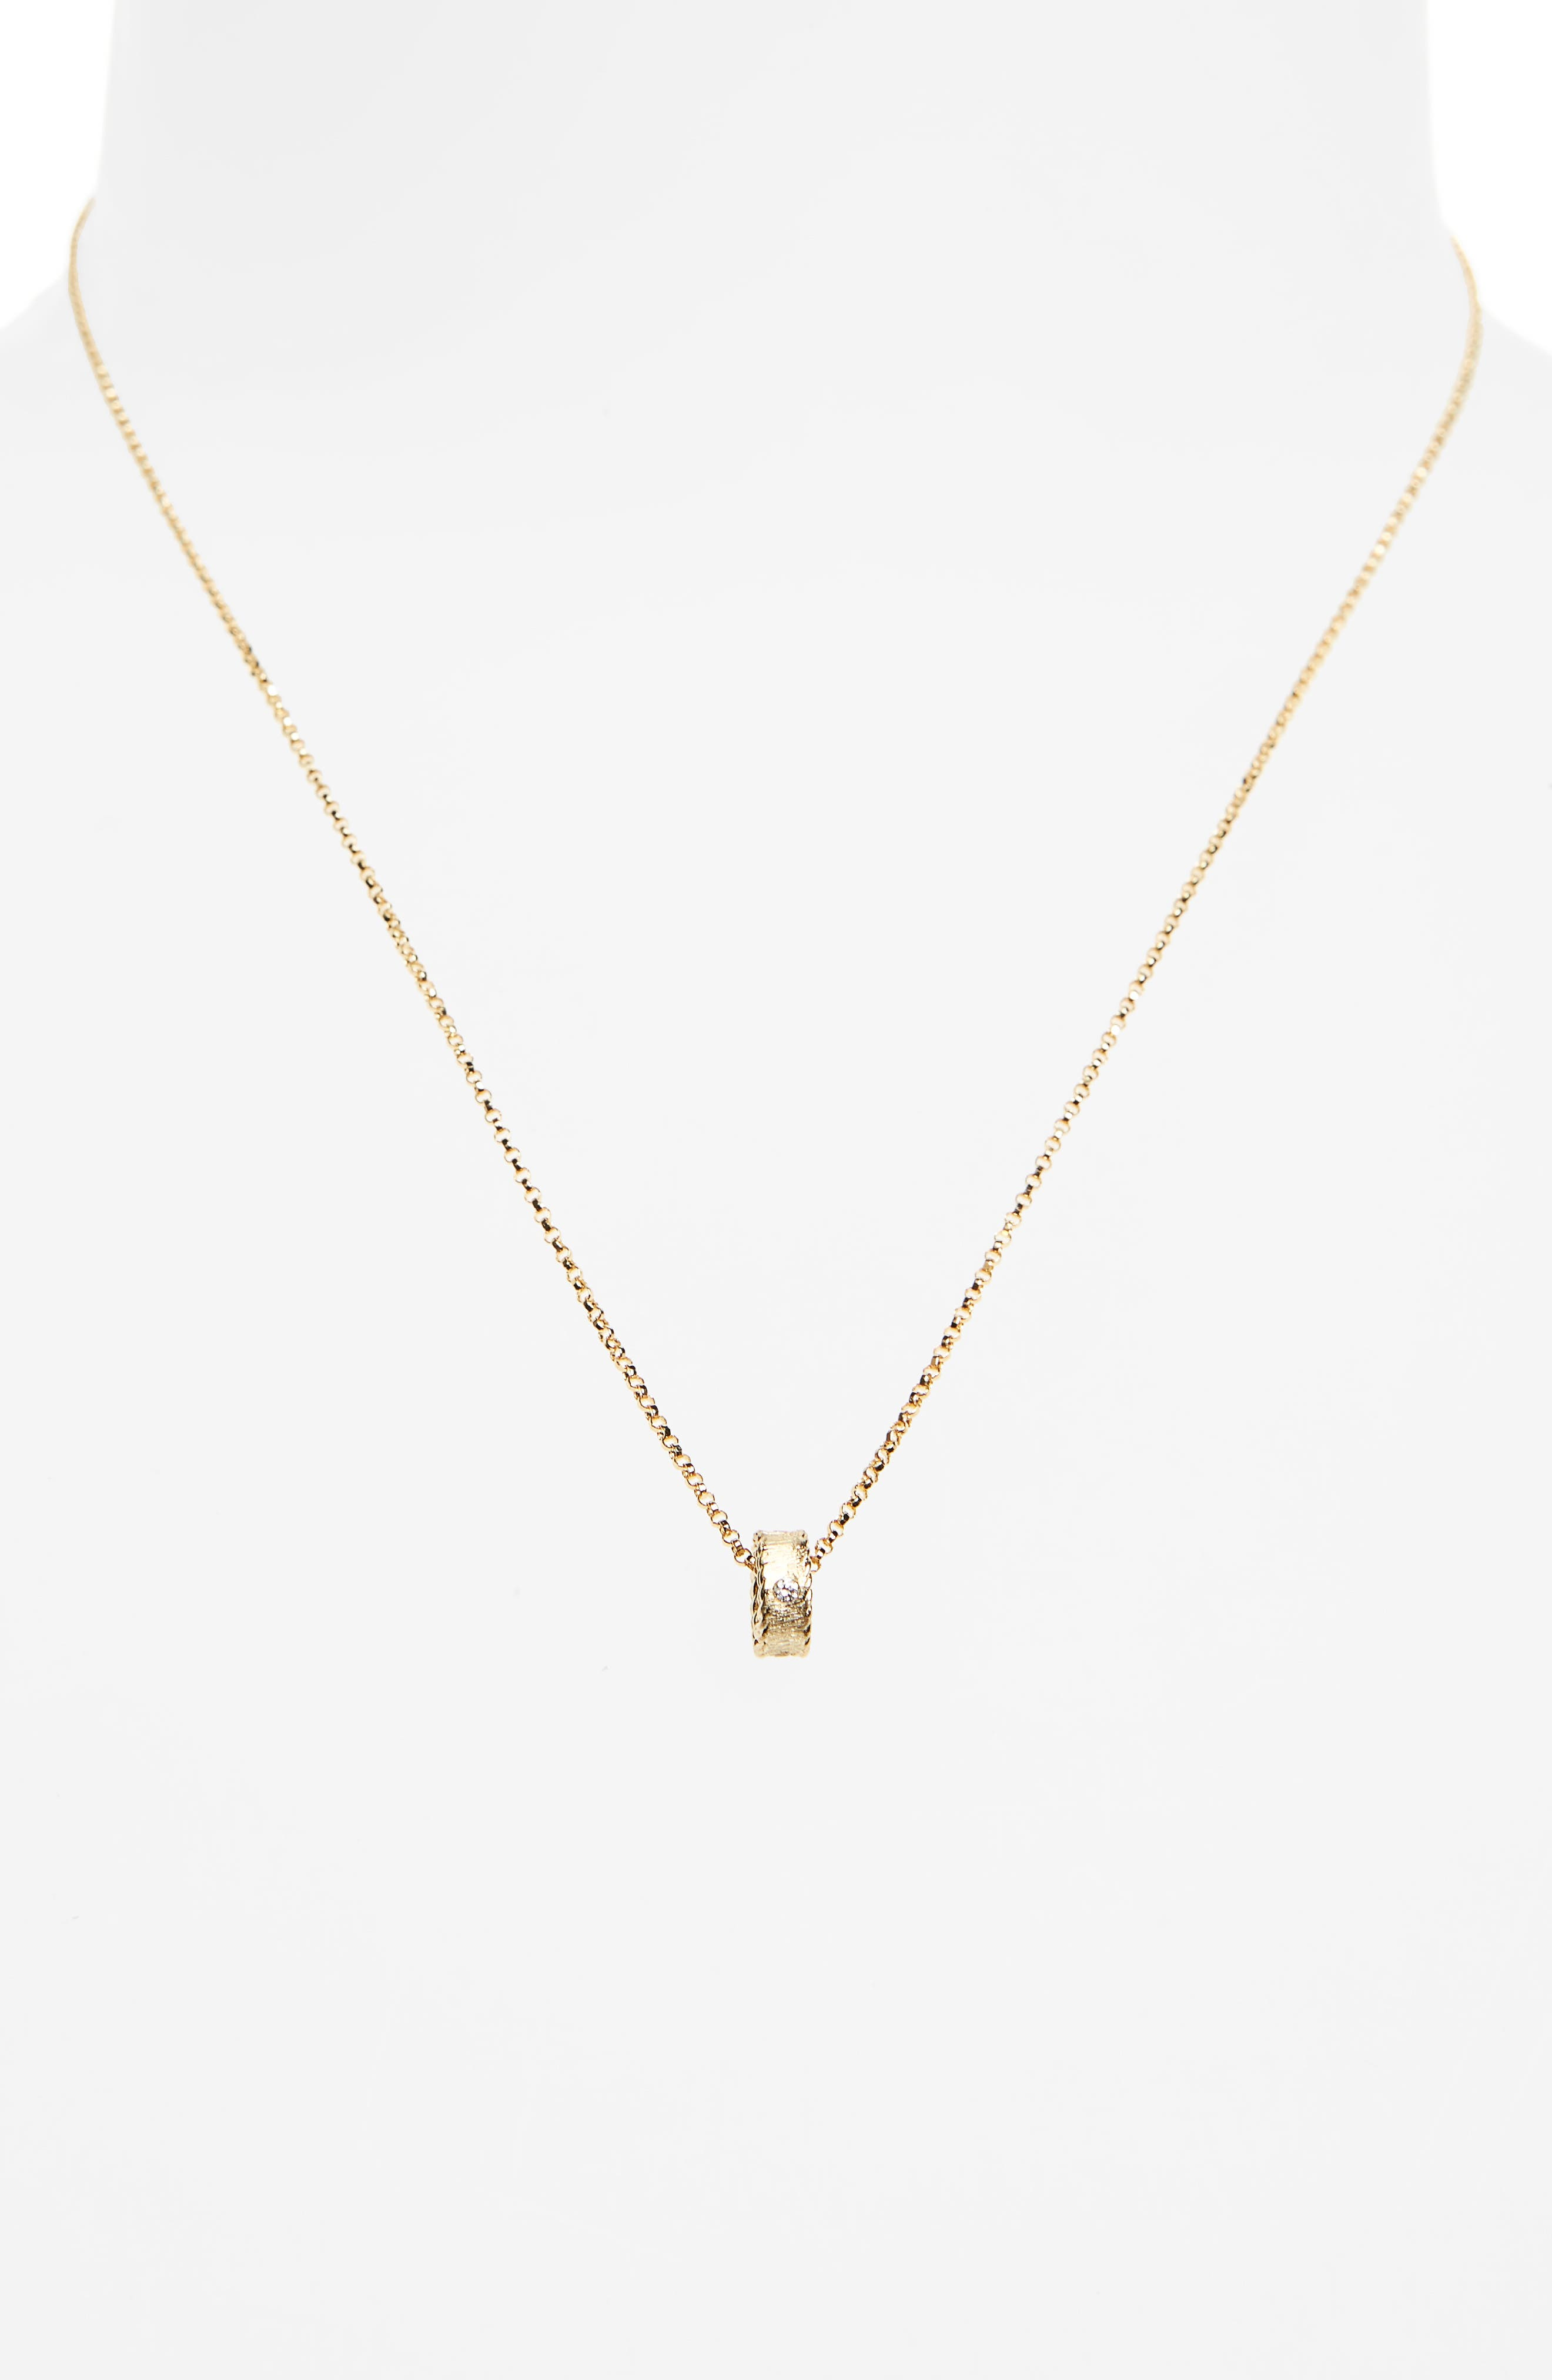 Diamond Princess Pendant Necklace,                             Alternate thumbnail 2, color,                             Yellow Gold